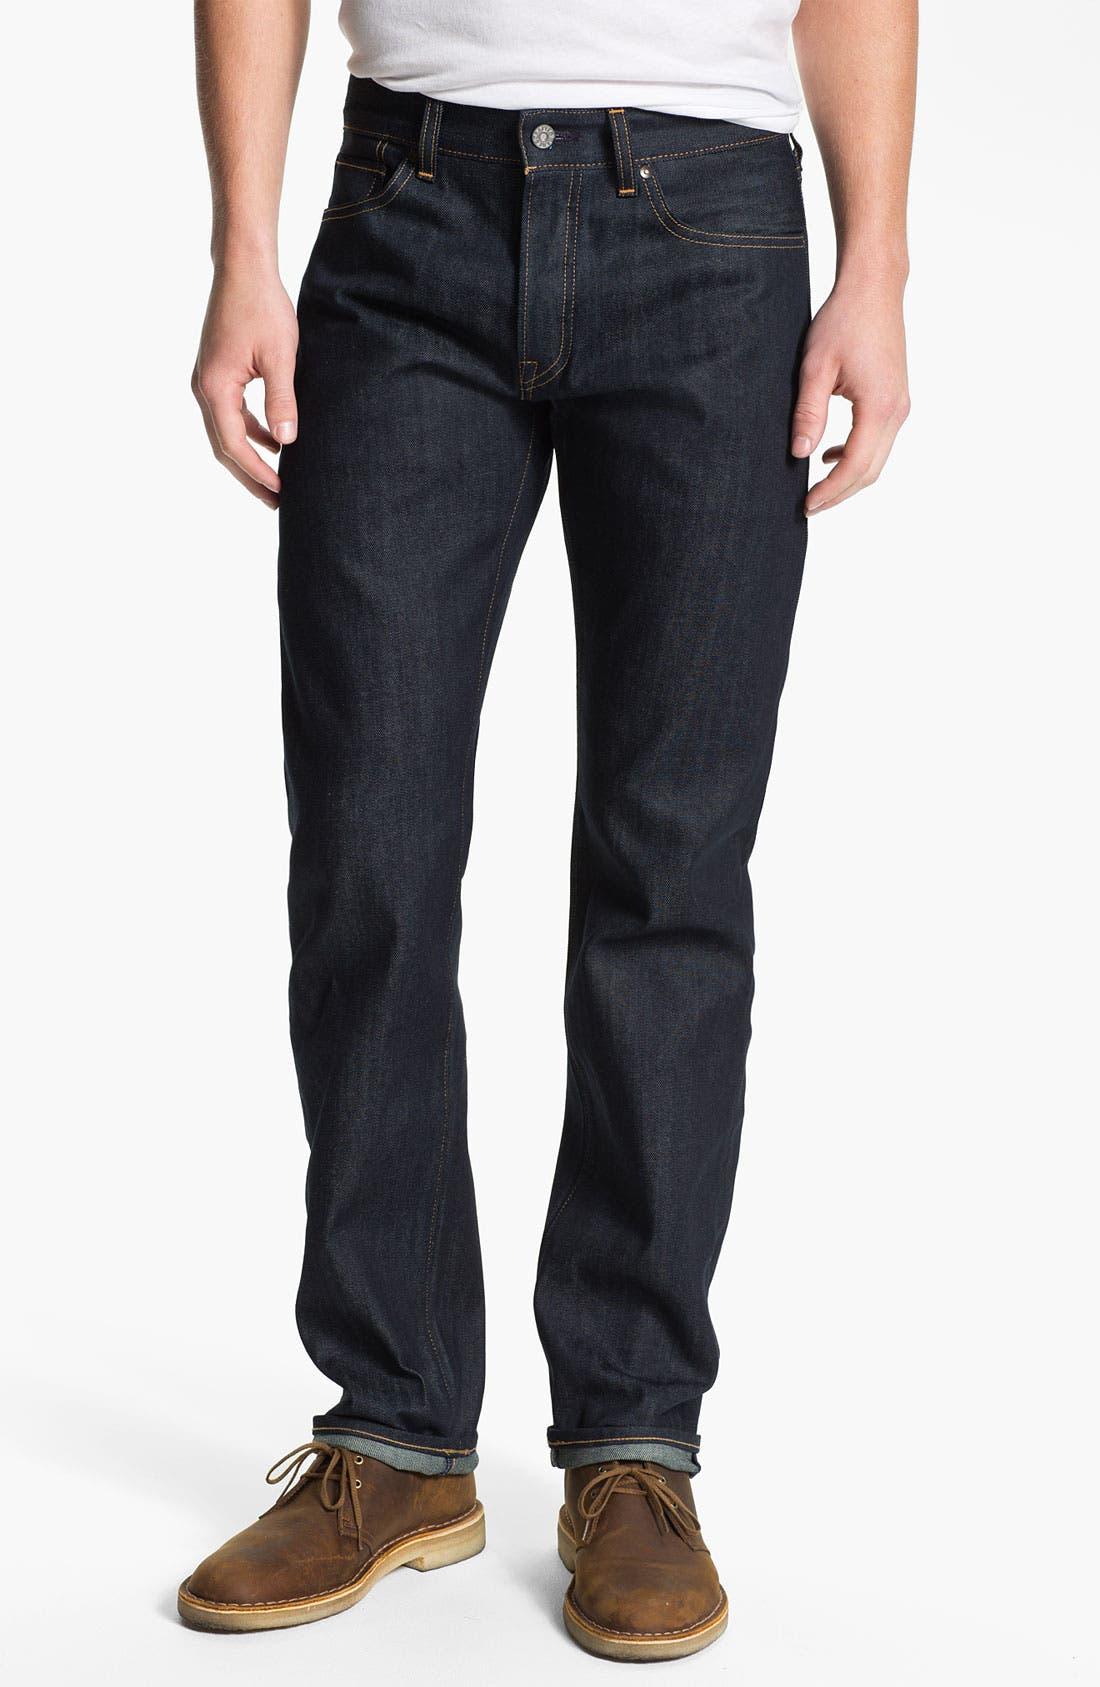 Main Image - Levi's® Made & Crafted™ 'Ruler' Straight Leg Jeans (Indigo Rigid)